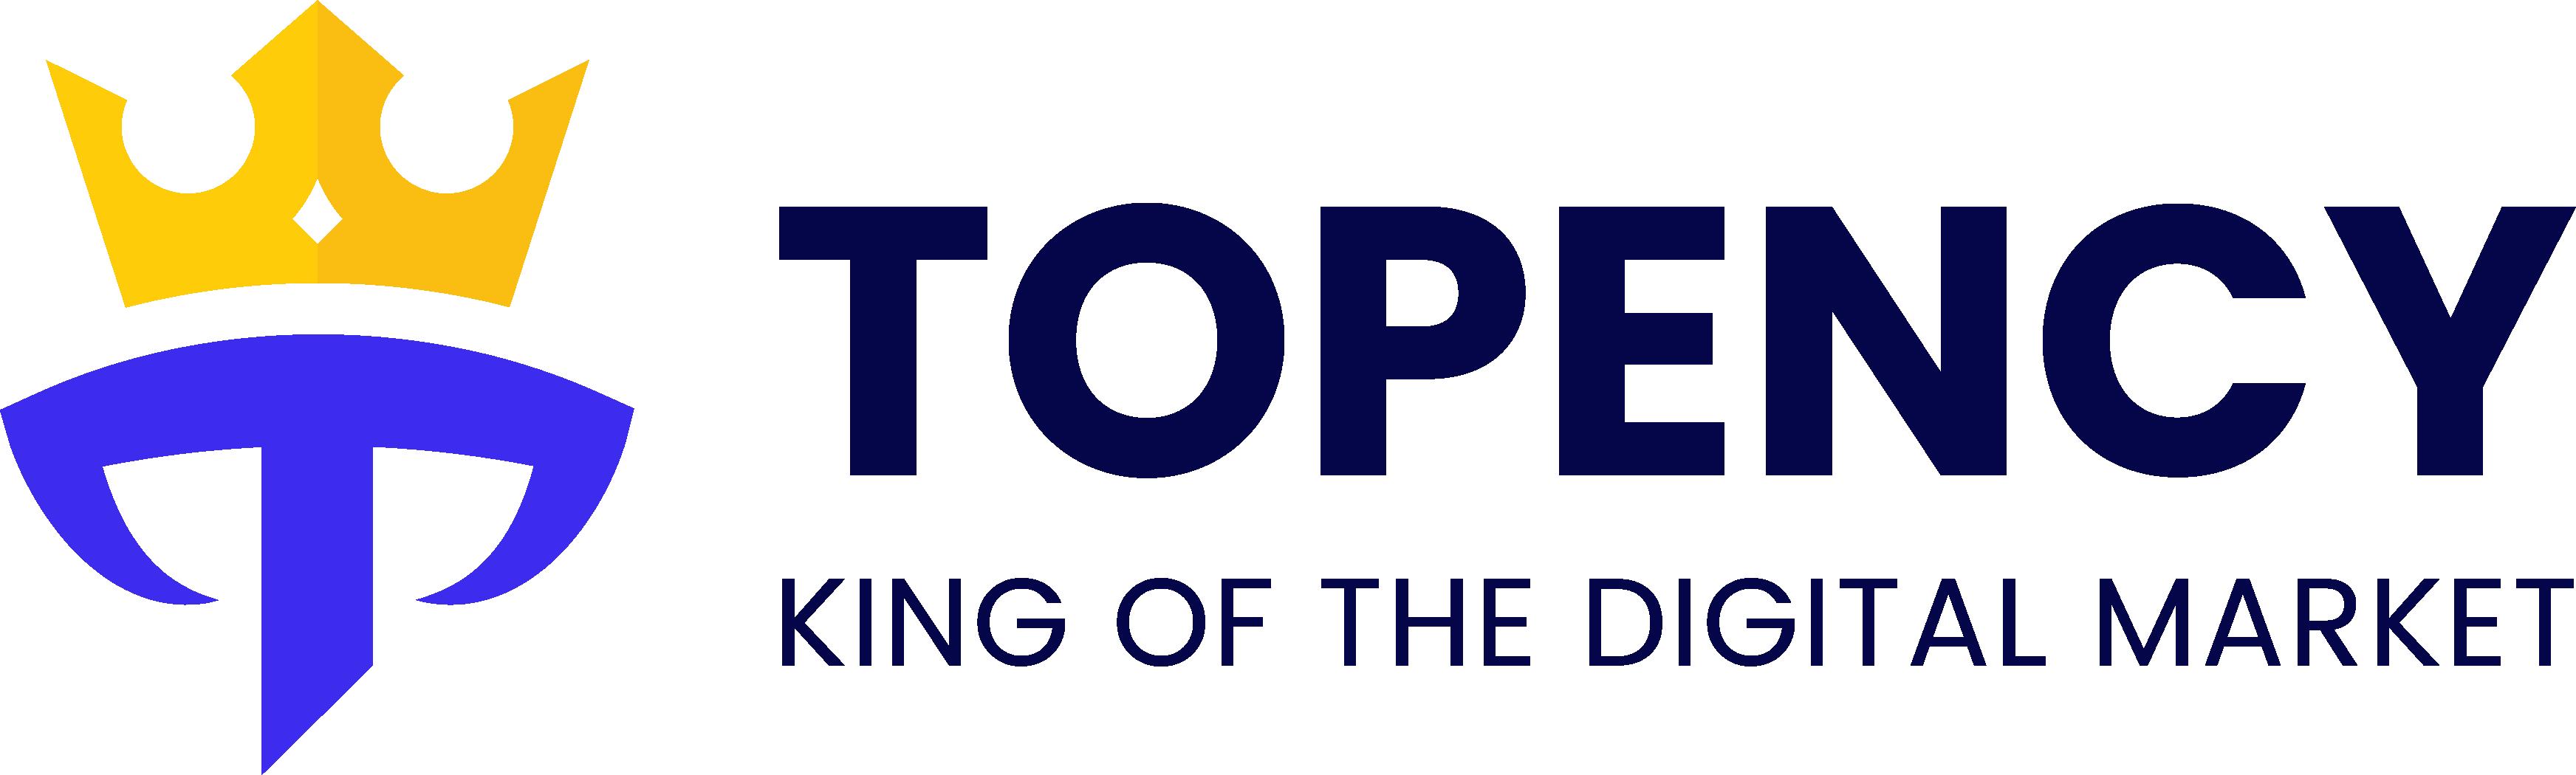 Topency | Digital Marketing, Website Design, SEO, Graphic Design Agency